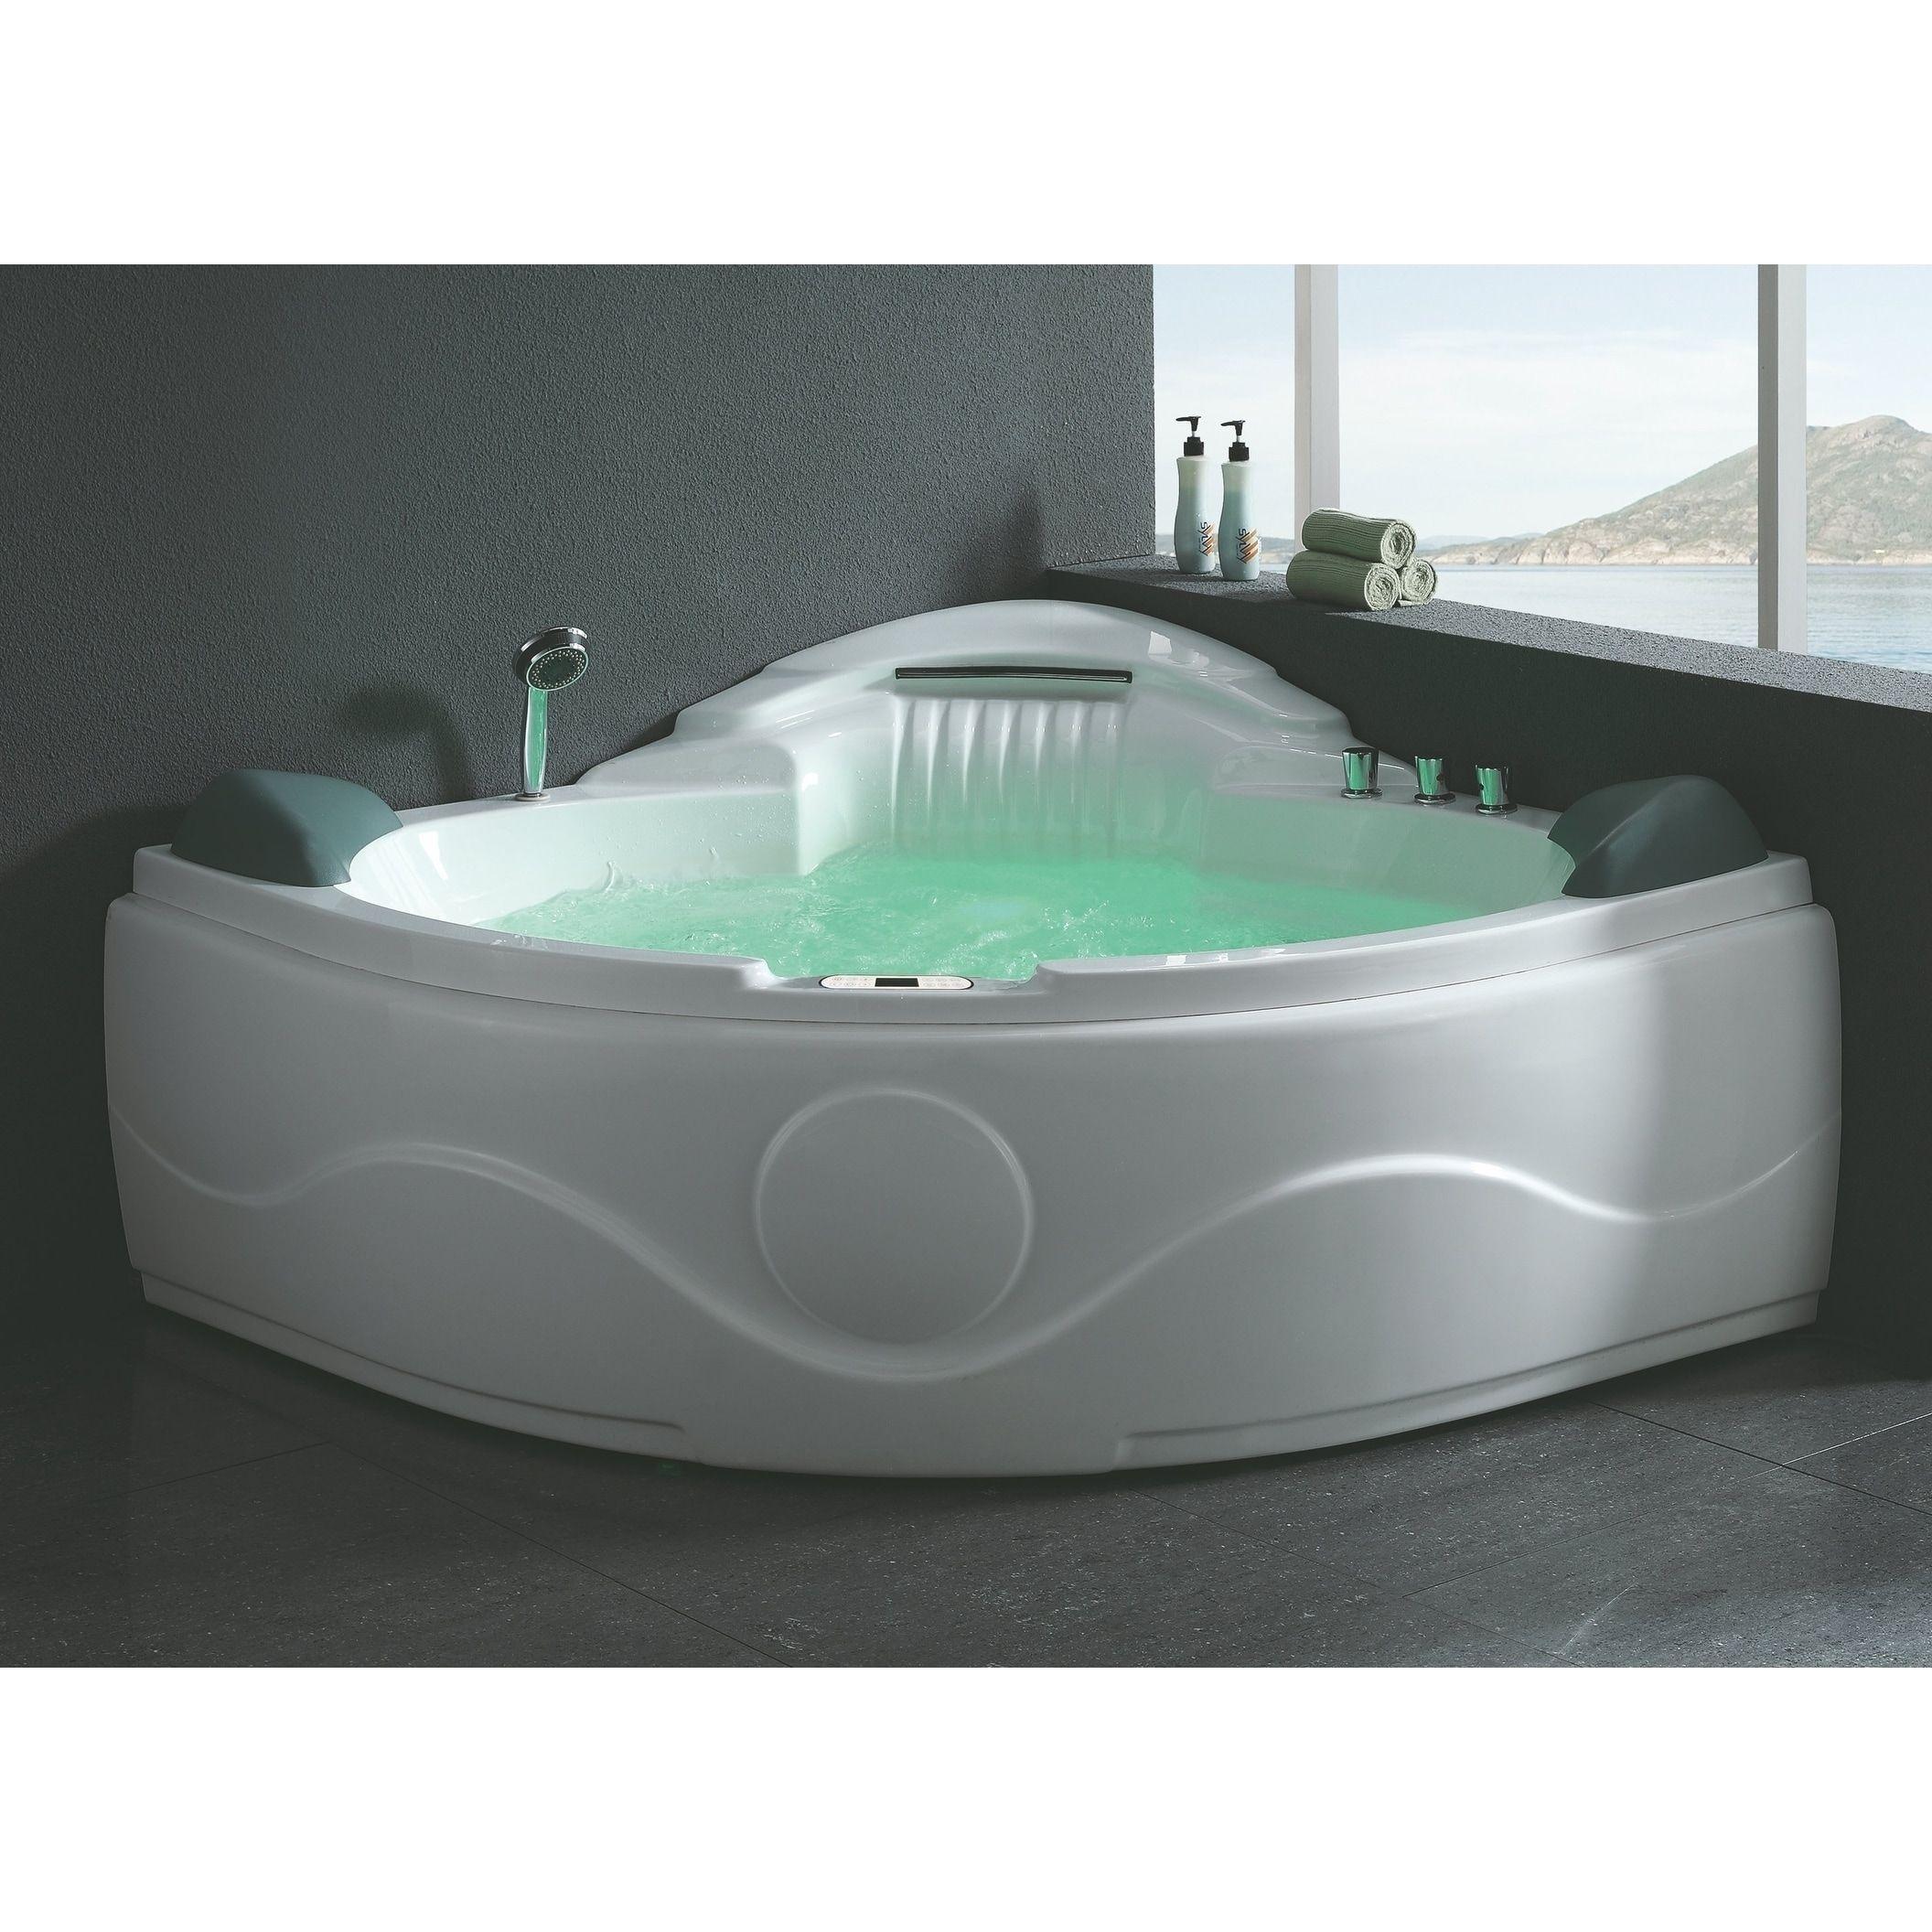 Extra Wide Bathtub Ideas On Foter